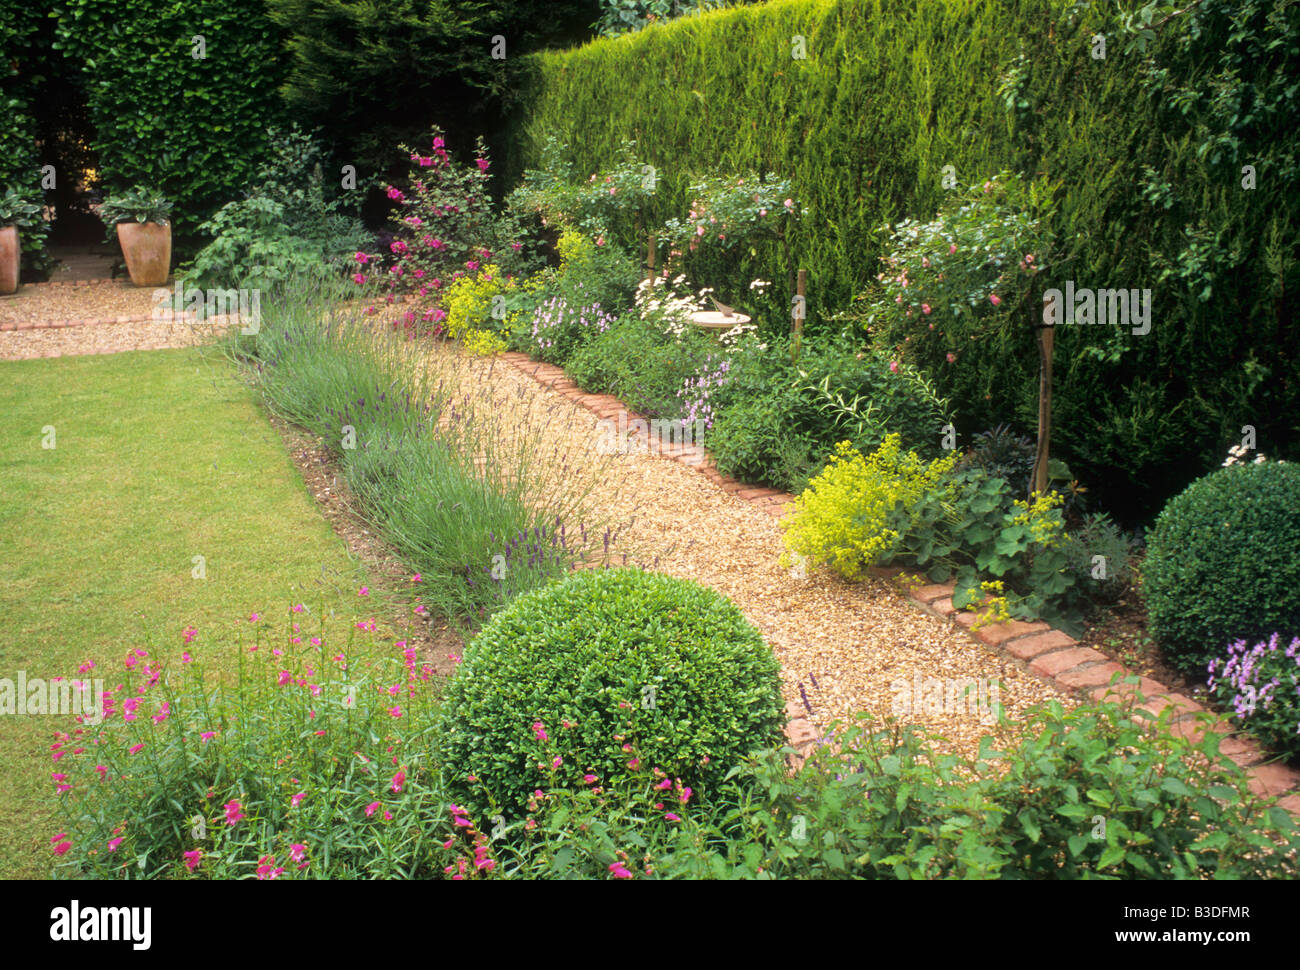 leylandii hedge stockfotos leylandii hedge bilder alamy. Black Bedroom Furniture Sets. Home Design Ideas